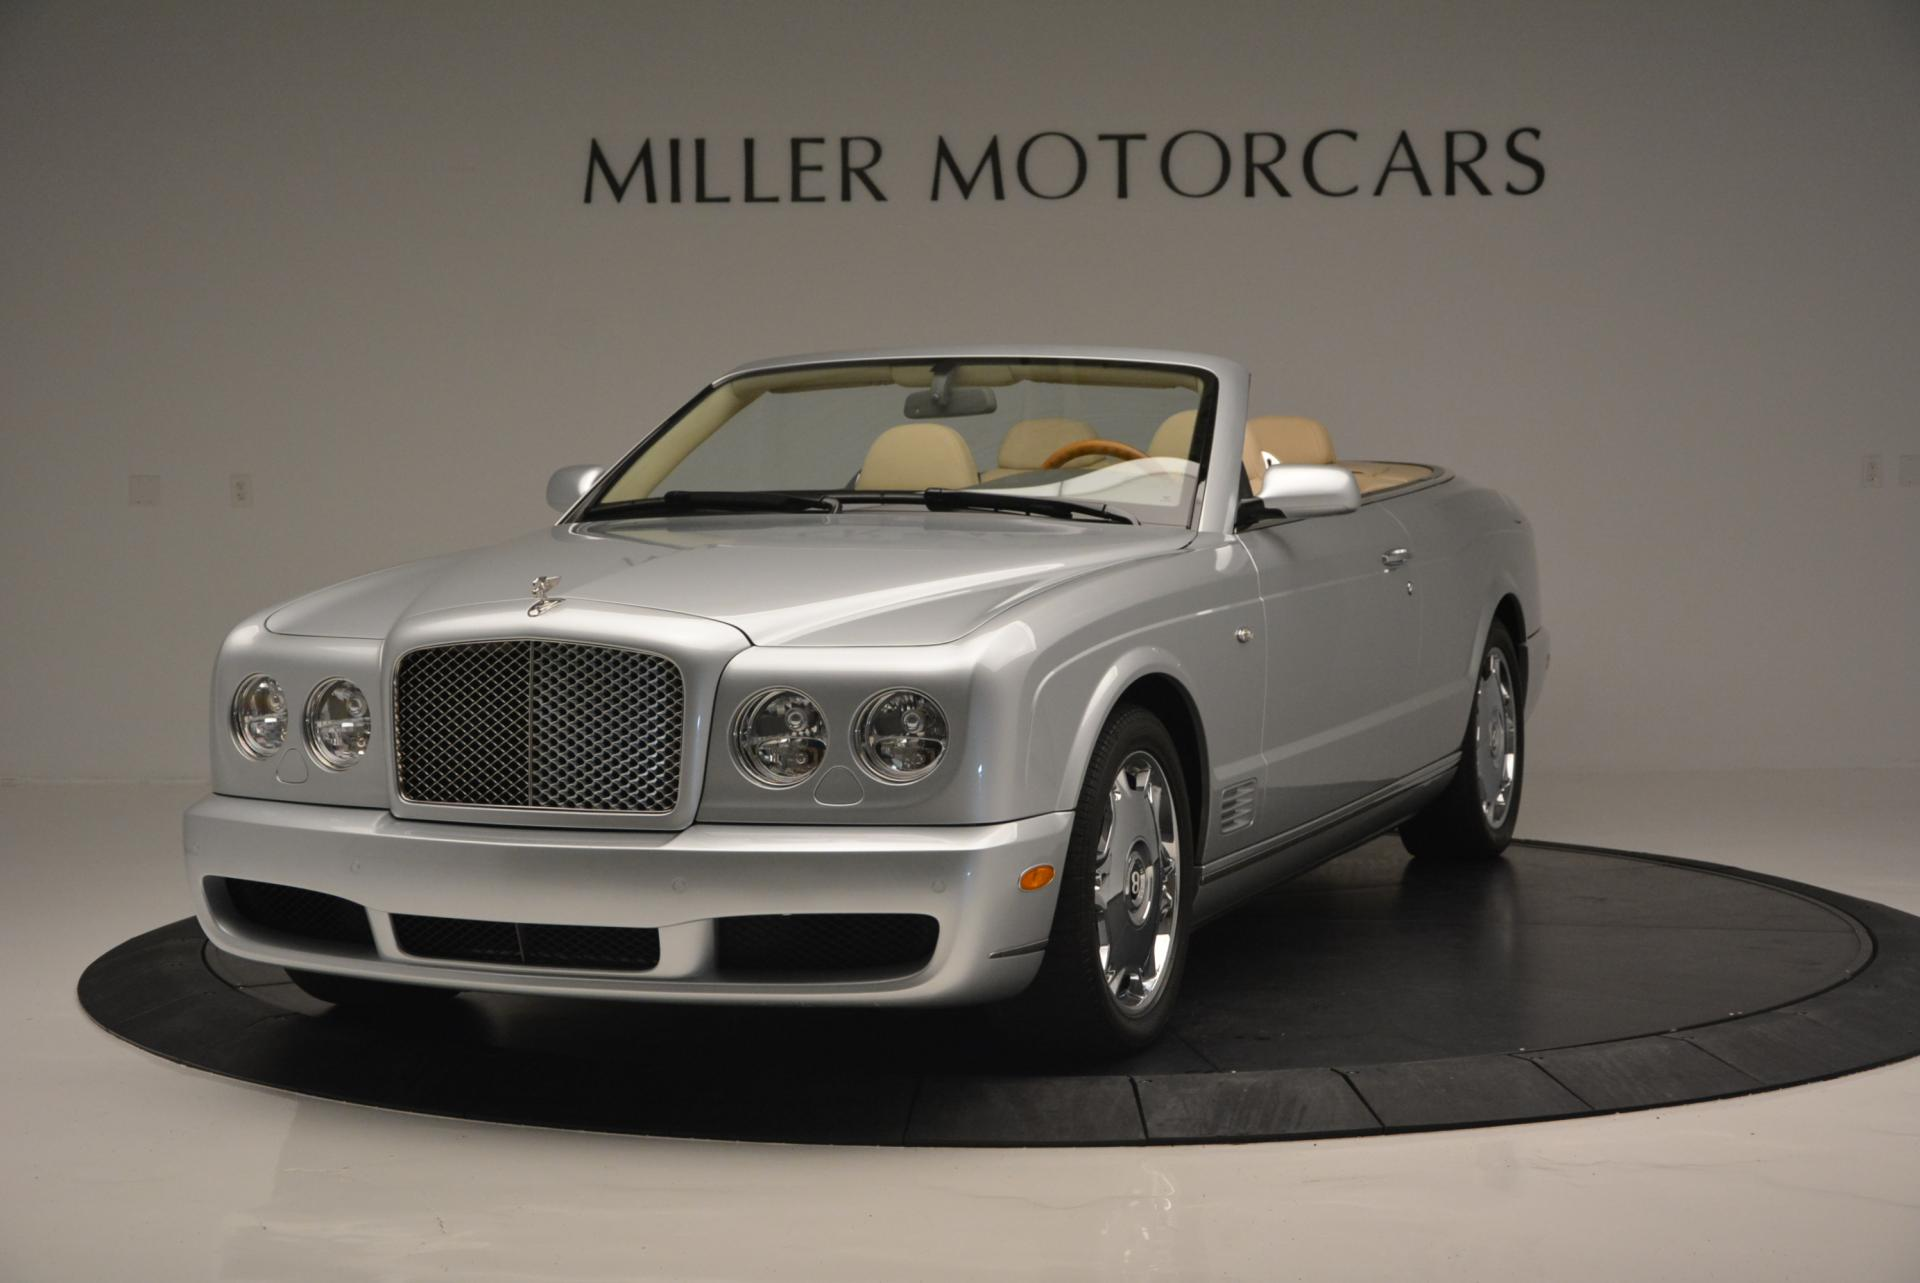 Used 2008 Bentley Azure for sale Sold at Maserati of Westport in Westport CT 06880 1